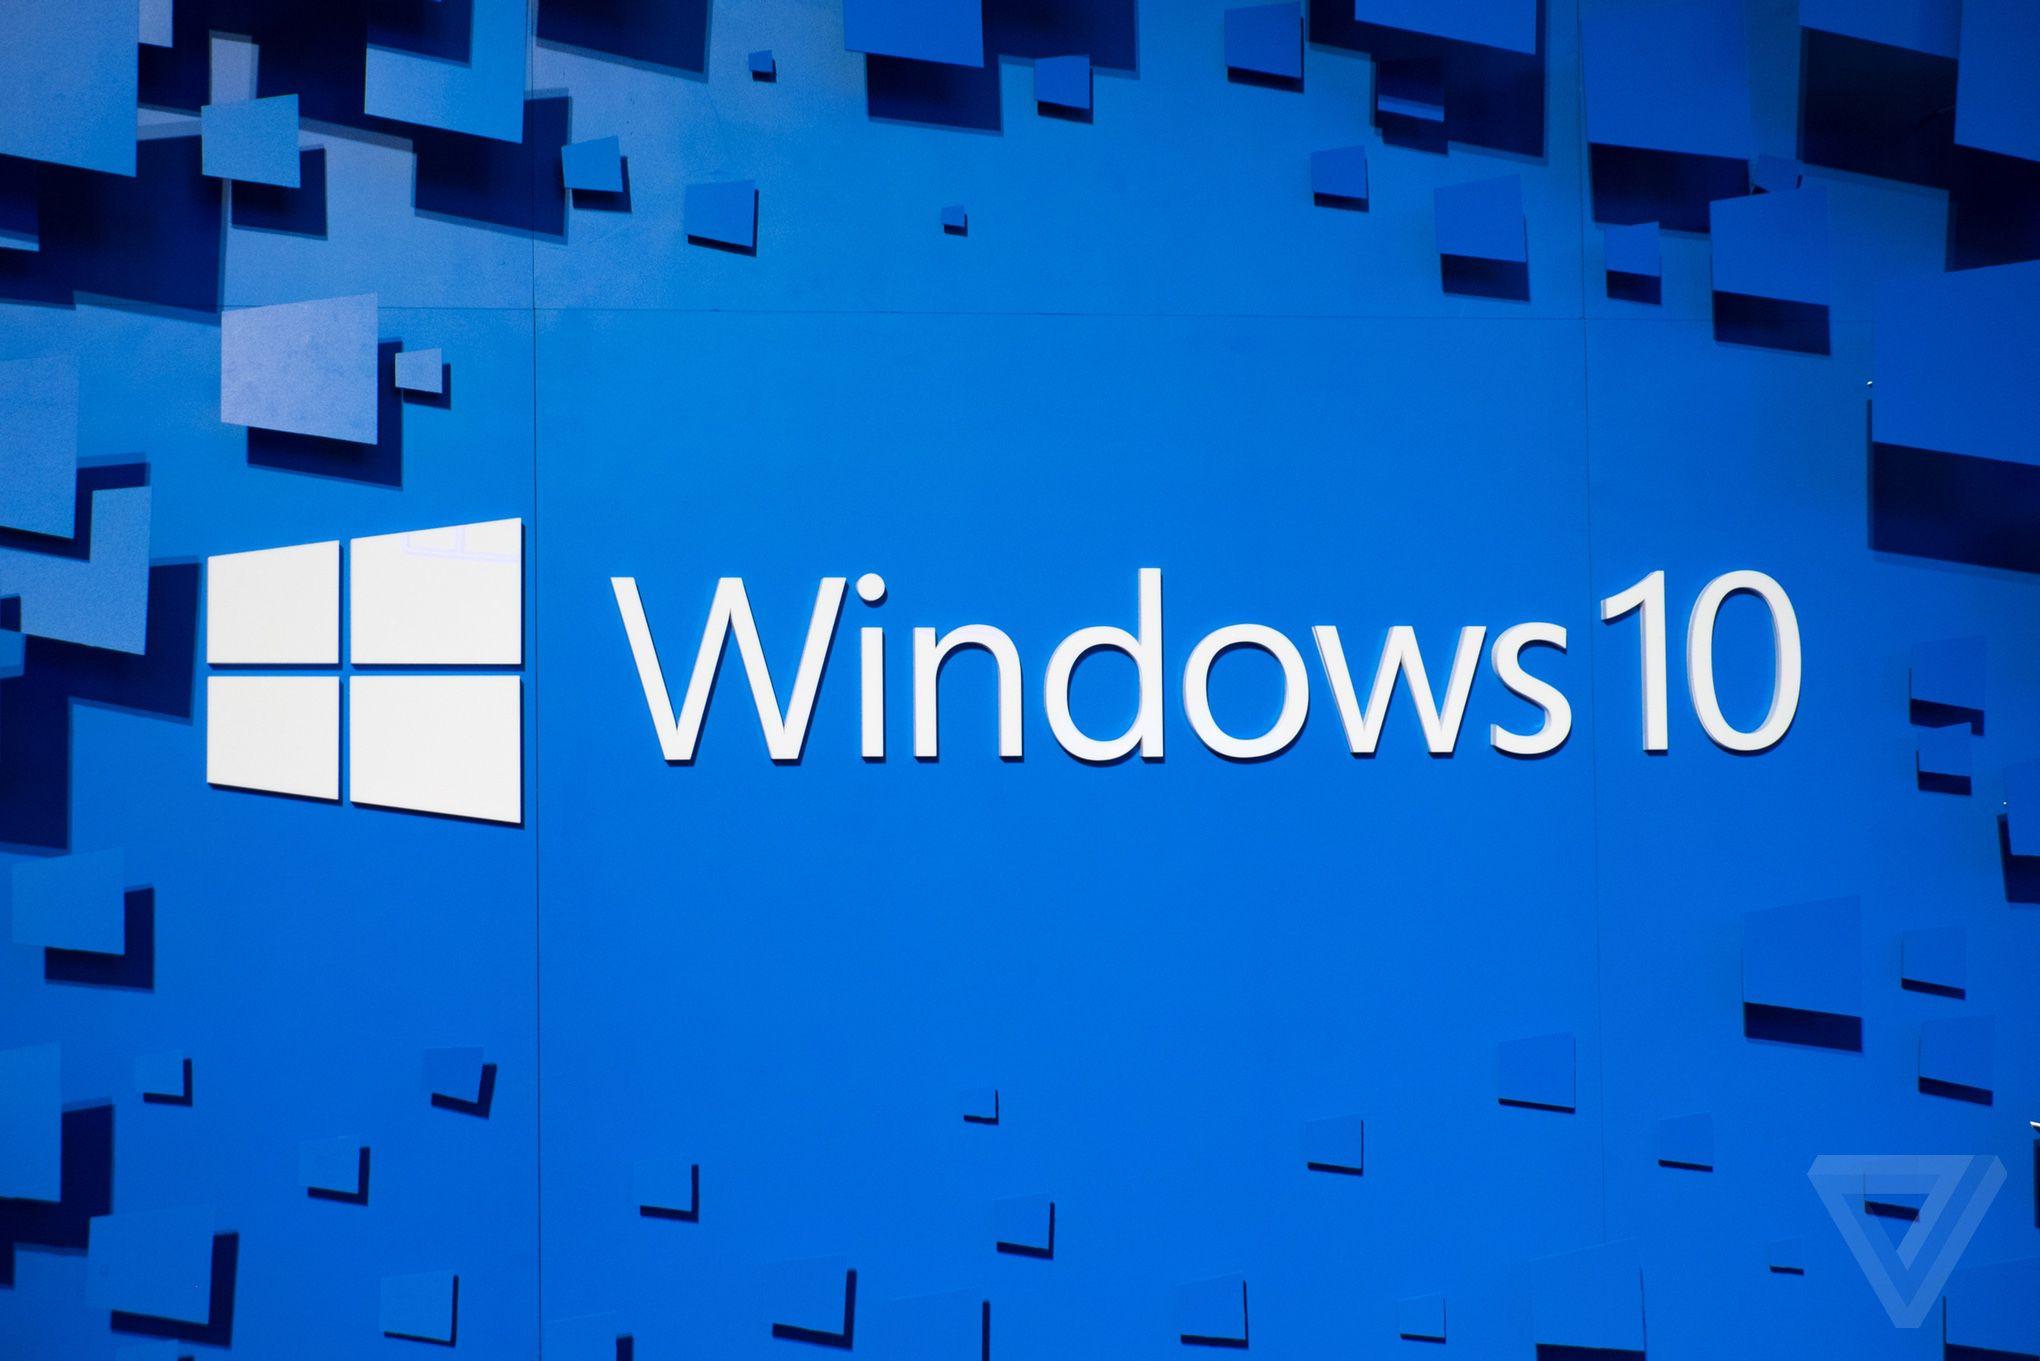 'Microsoft Windows 10 stock' from the web at 'https://cdn.vox-cdn.com/thumbor/1VZ_v4gutOUyVoQsJD75r74Hid8=/cdn.vox-cdn.com/uploads/chorus_asset/file/3919716/mswindows2_2040.0.jpg'